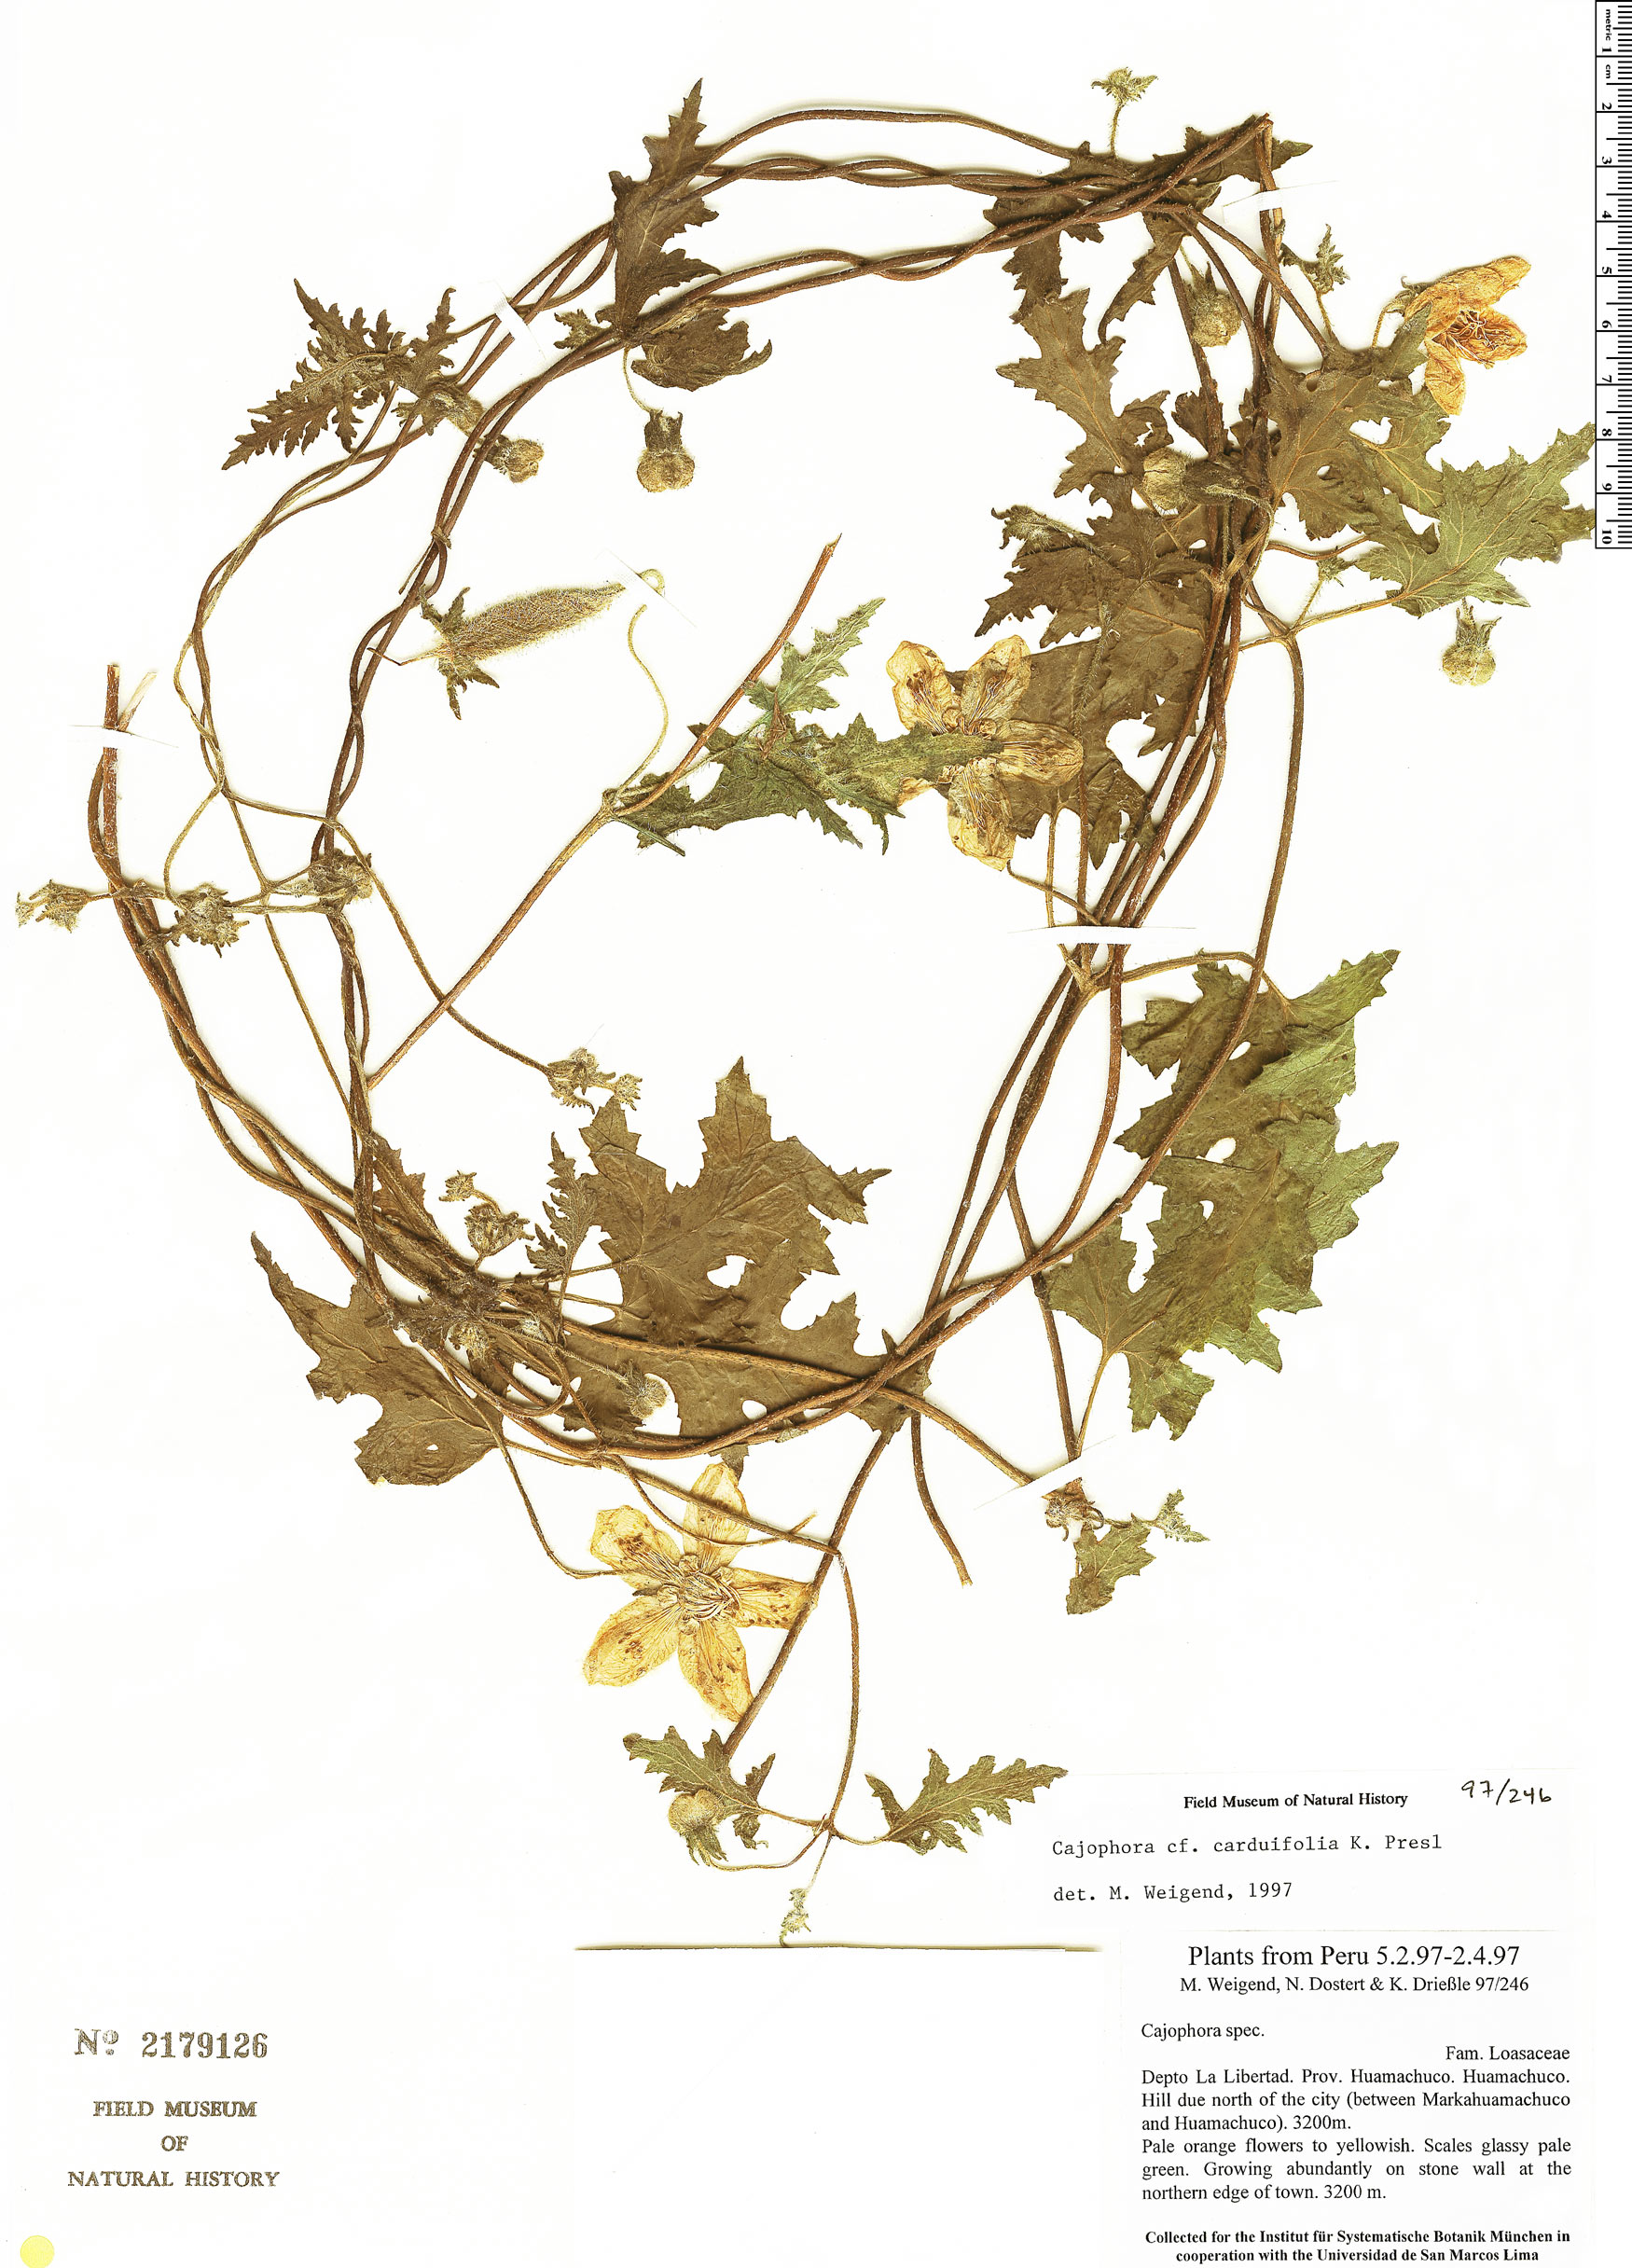 Specimen: Caiophora carduifolia